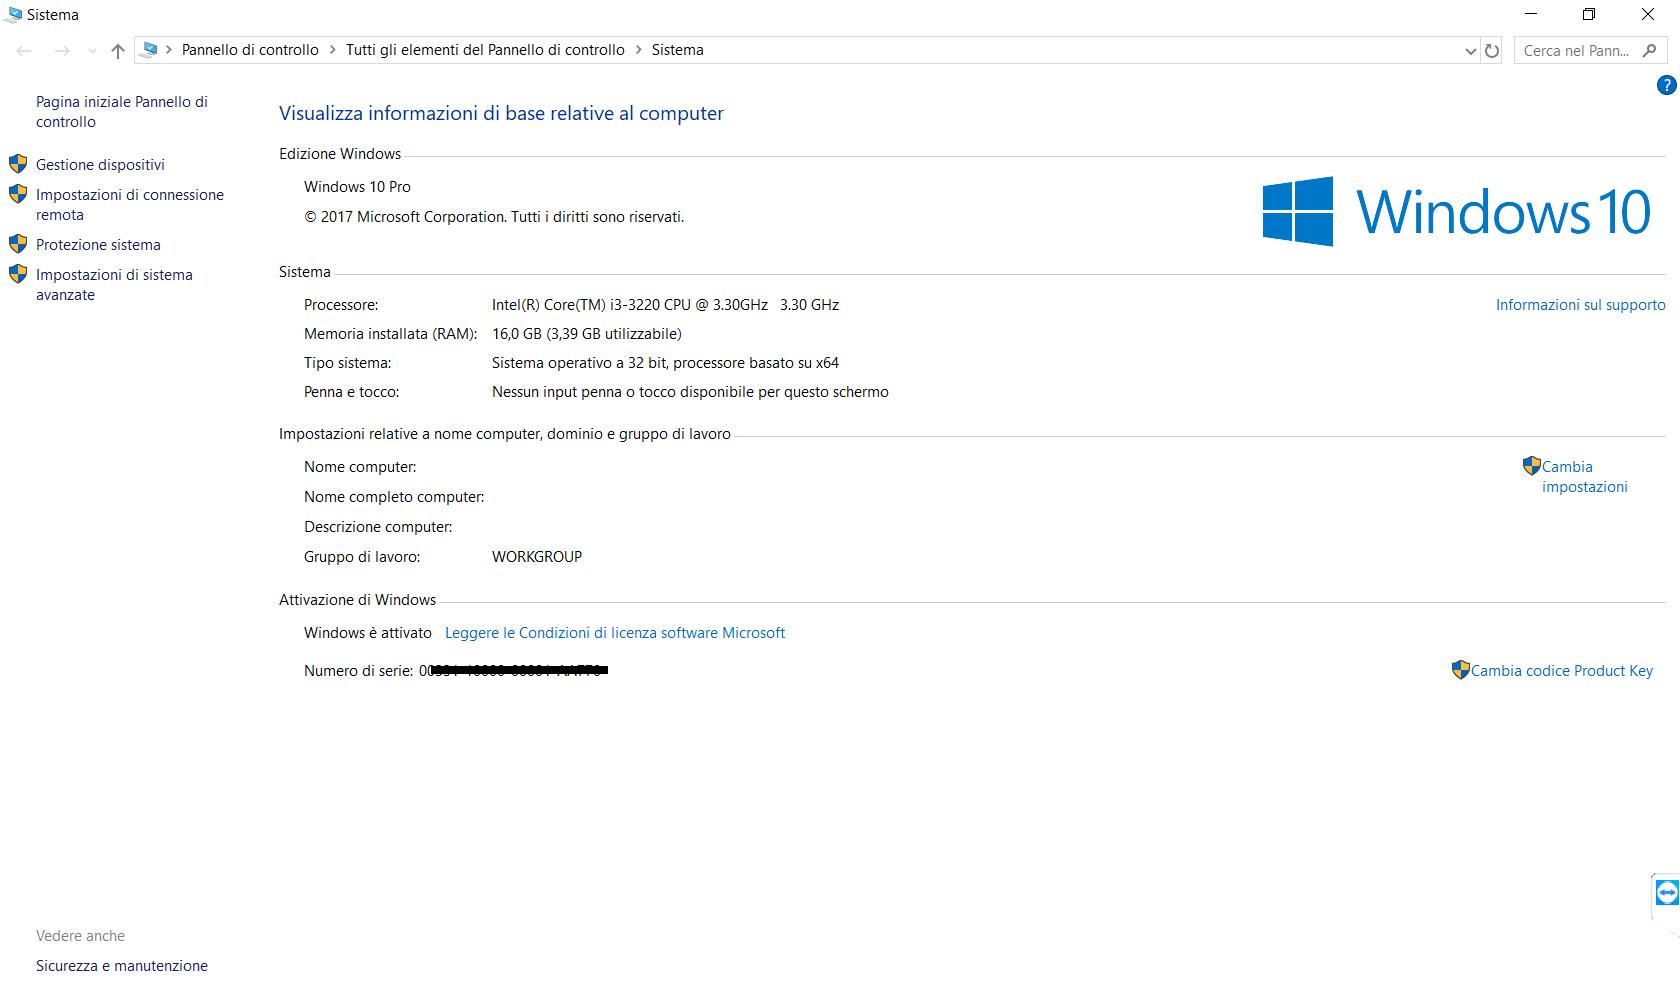 windows 10 gratis dicembre 2017